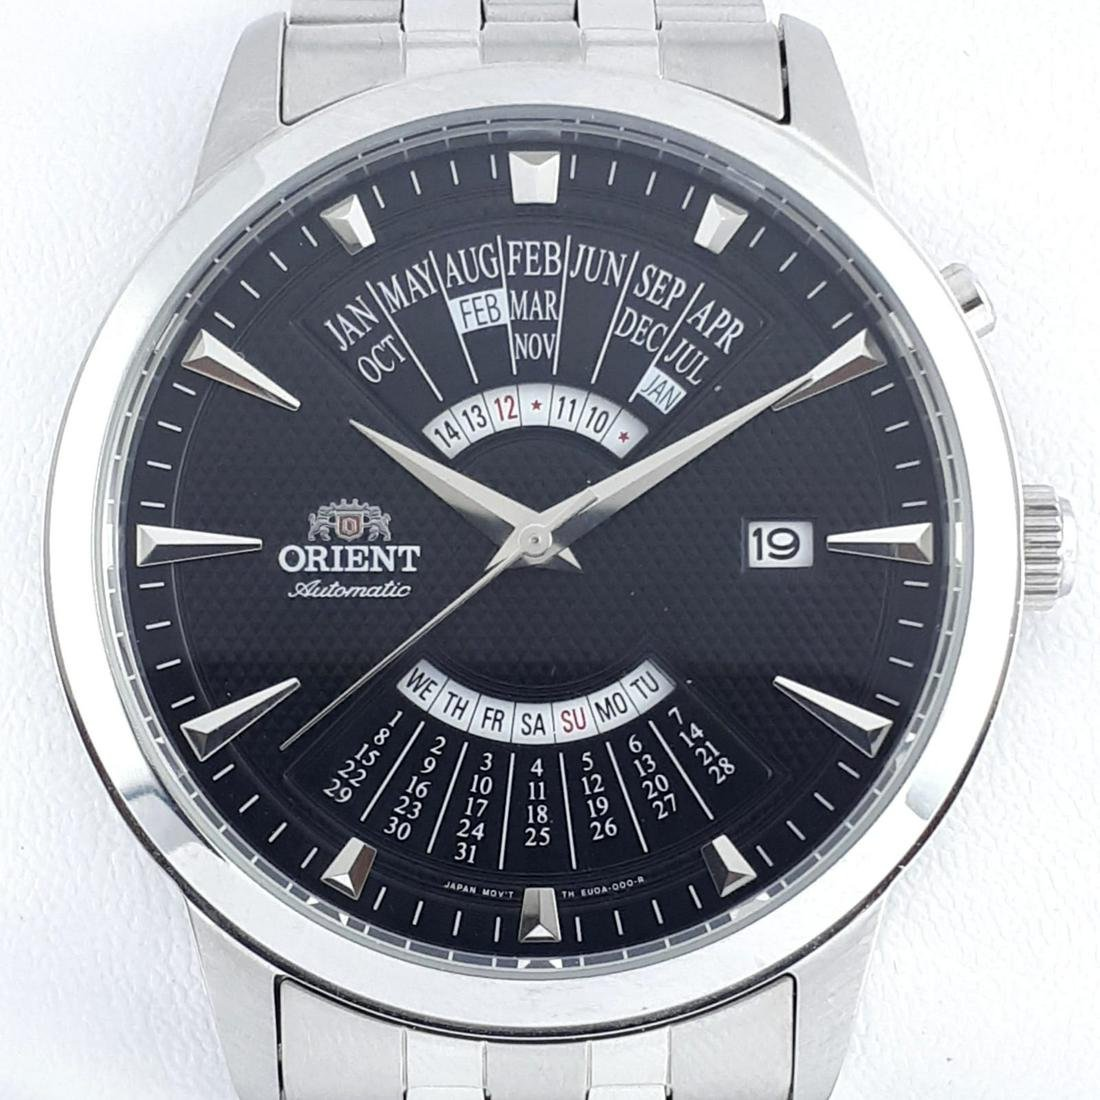 Orient International - Multi Year Calendar Automatic -